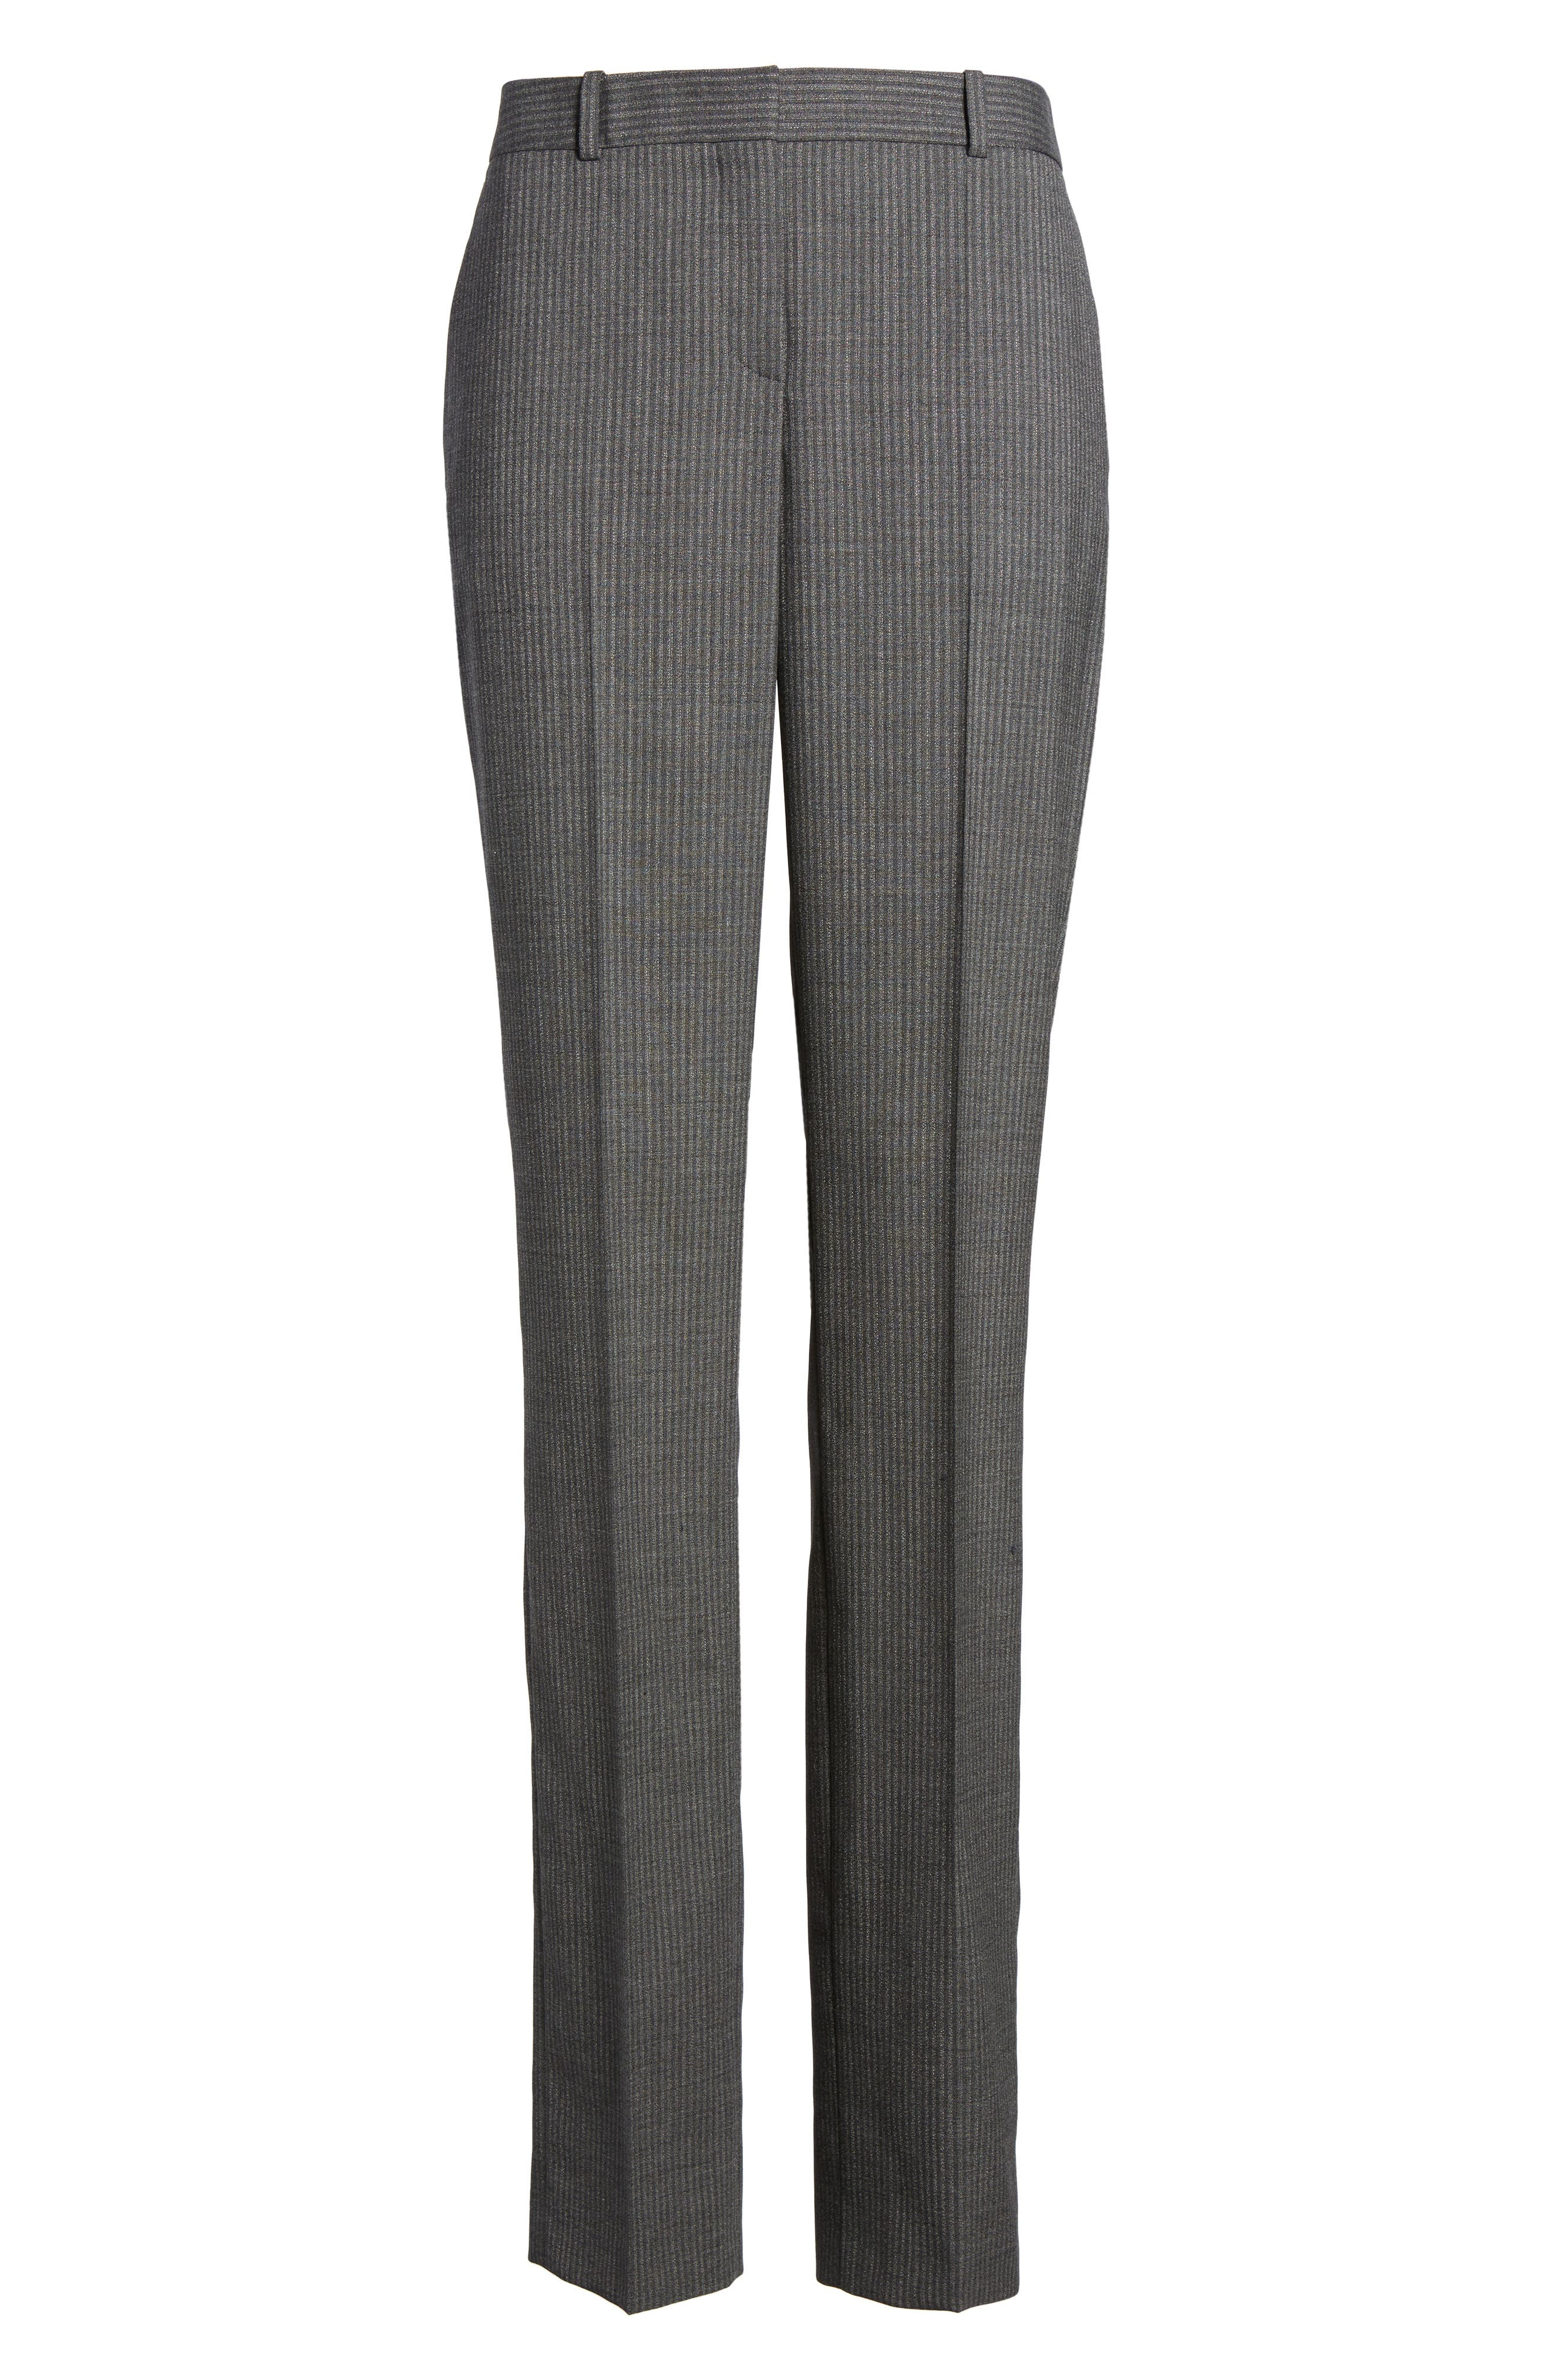 Titana Stretch Wool Trousers,                             Alternate thumbnail 6, color,                             Dark Grey Fantasy